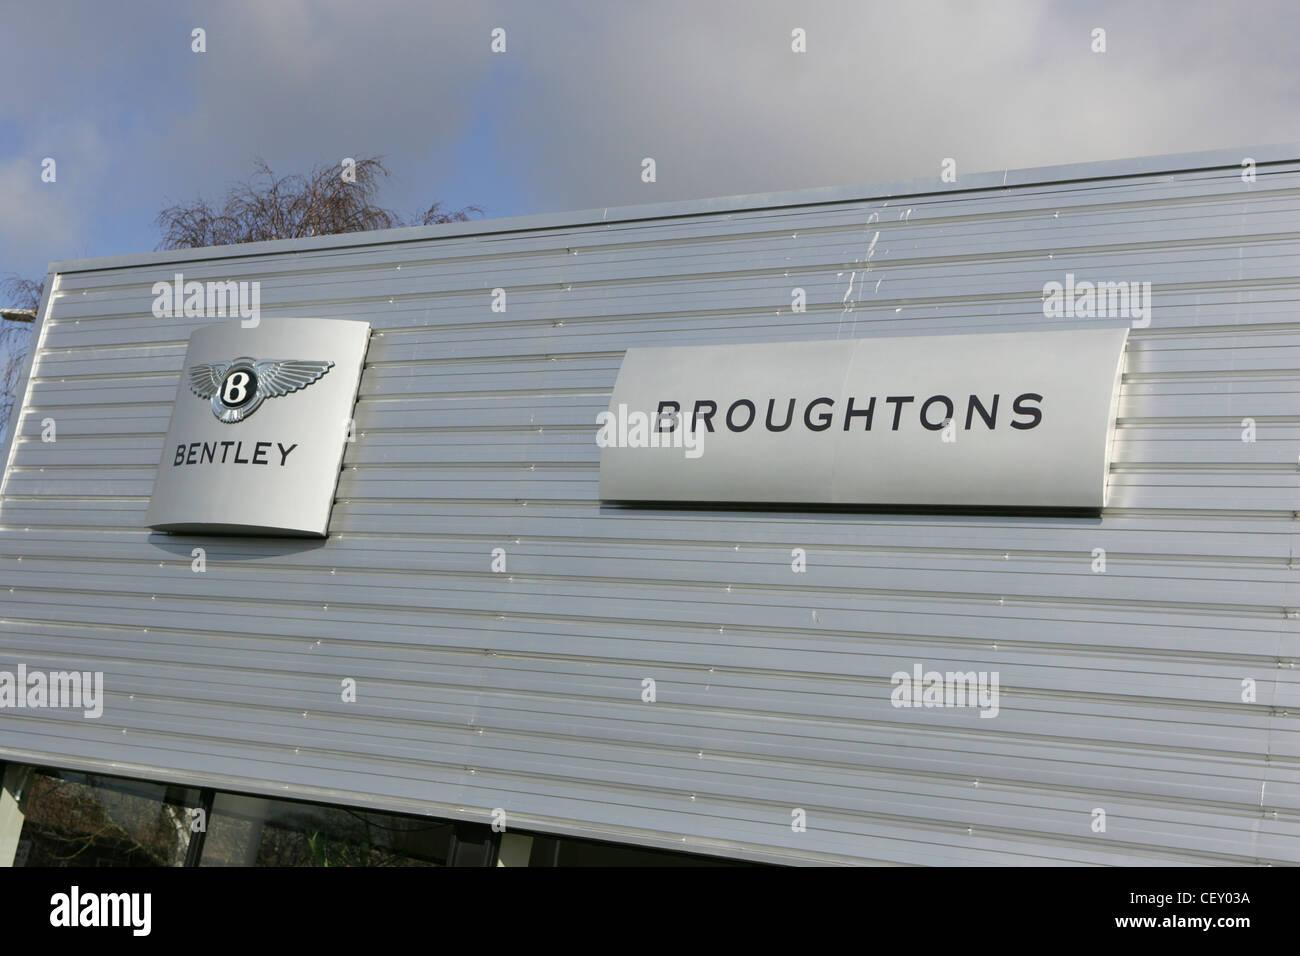 Broughtons Bentley Autohaus, Cheltenham uk Stockbild